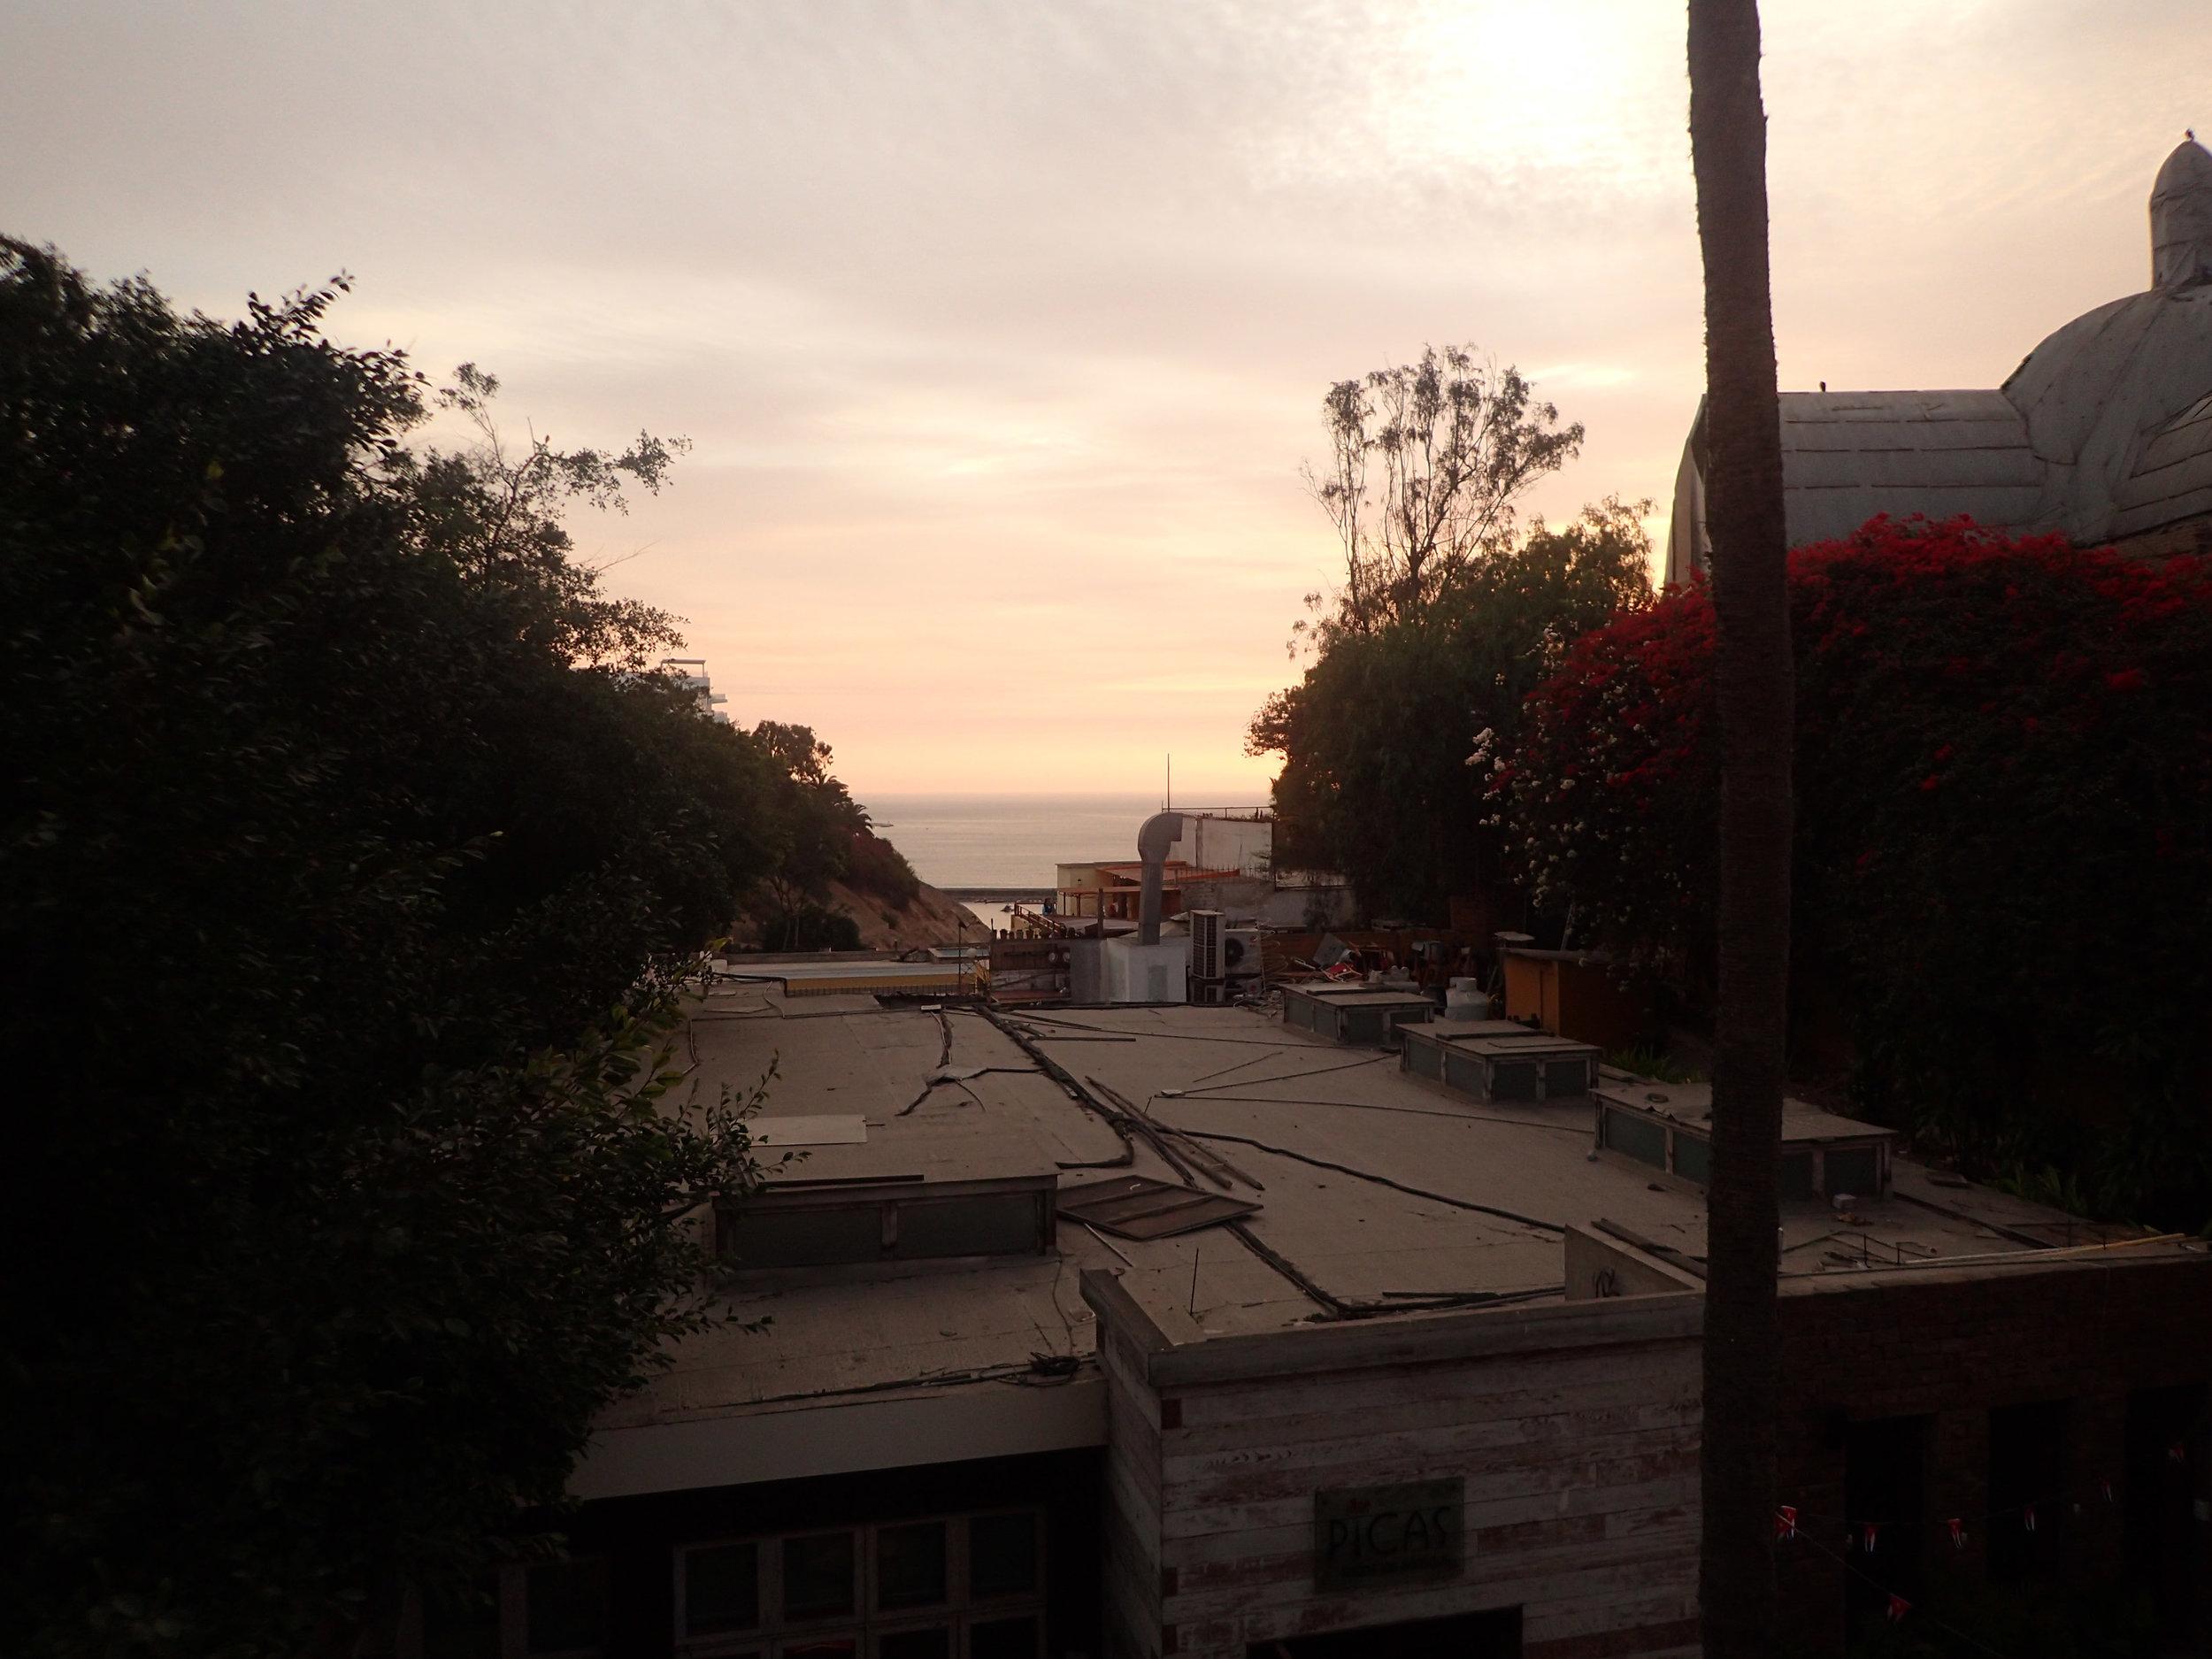 Barranco sunset.jpg